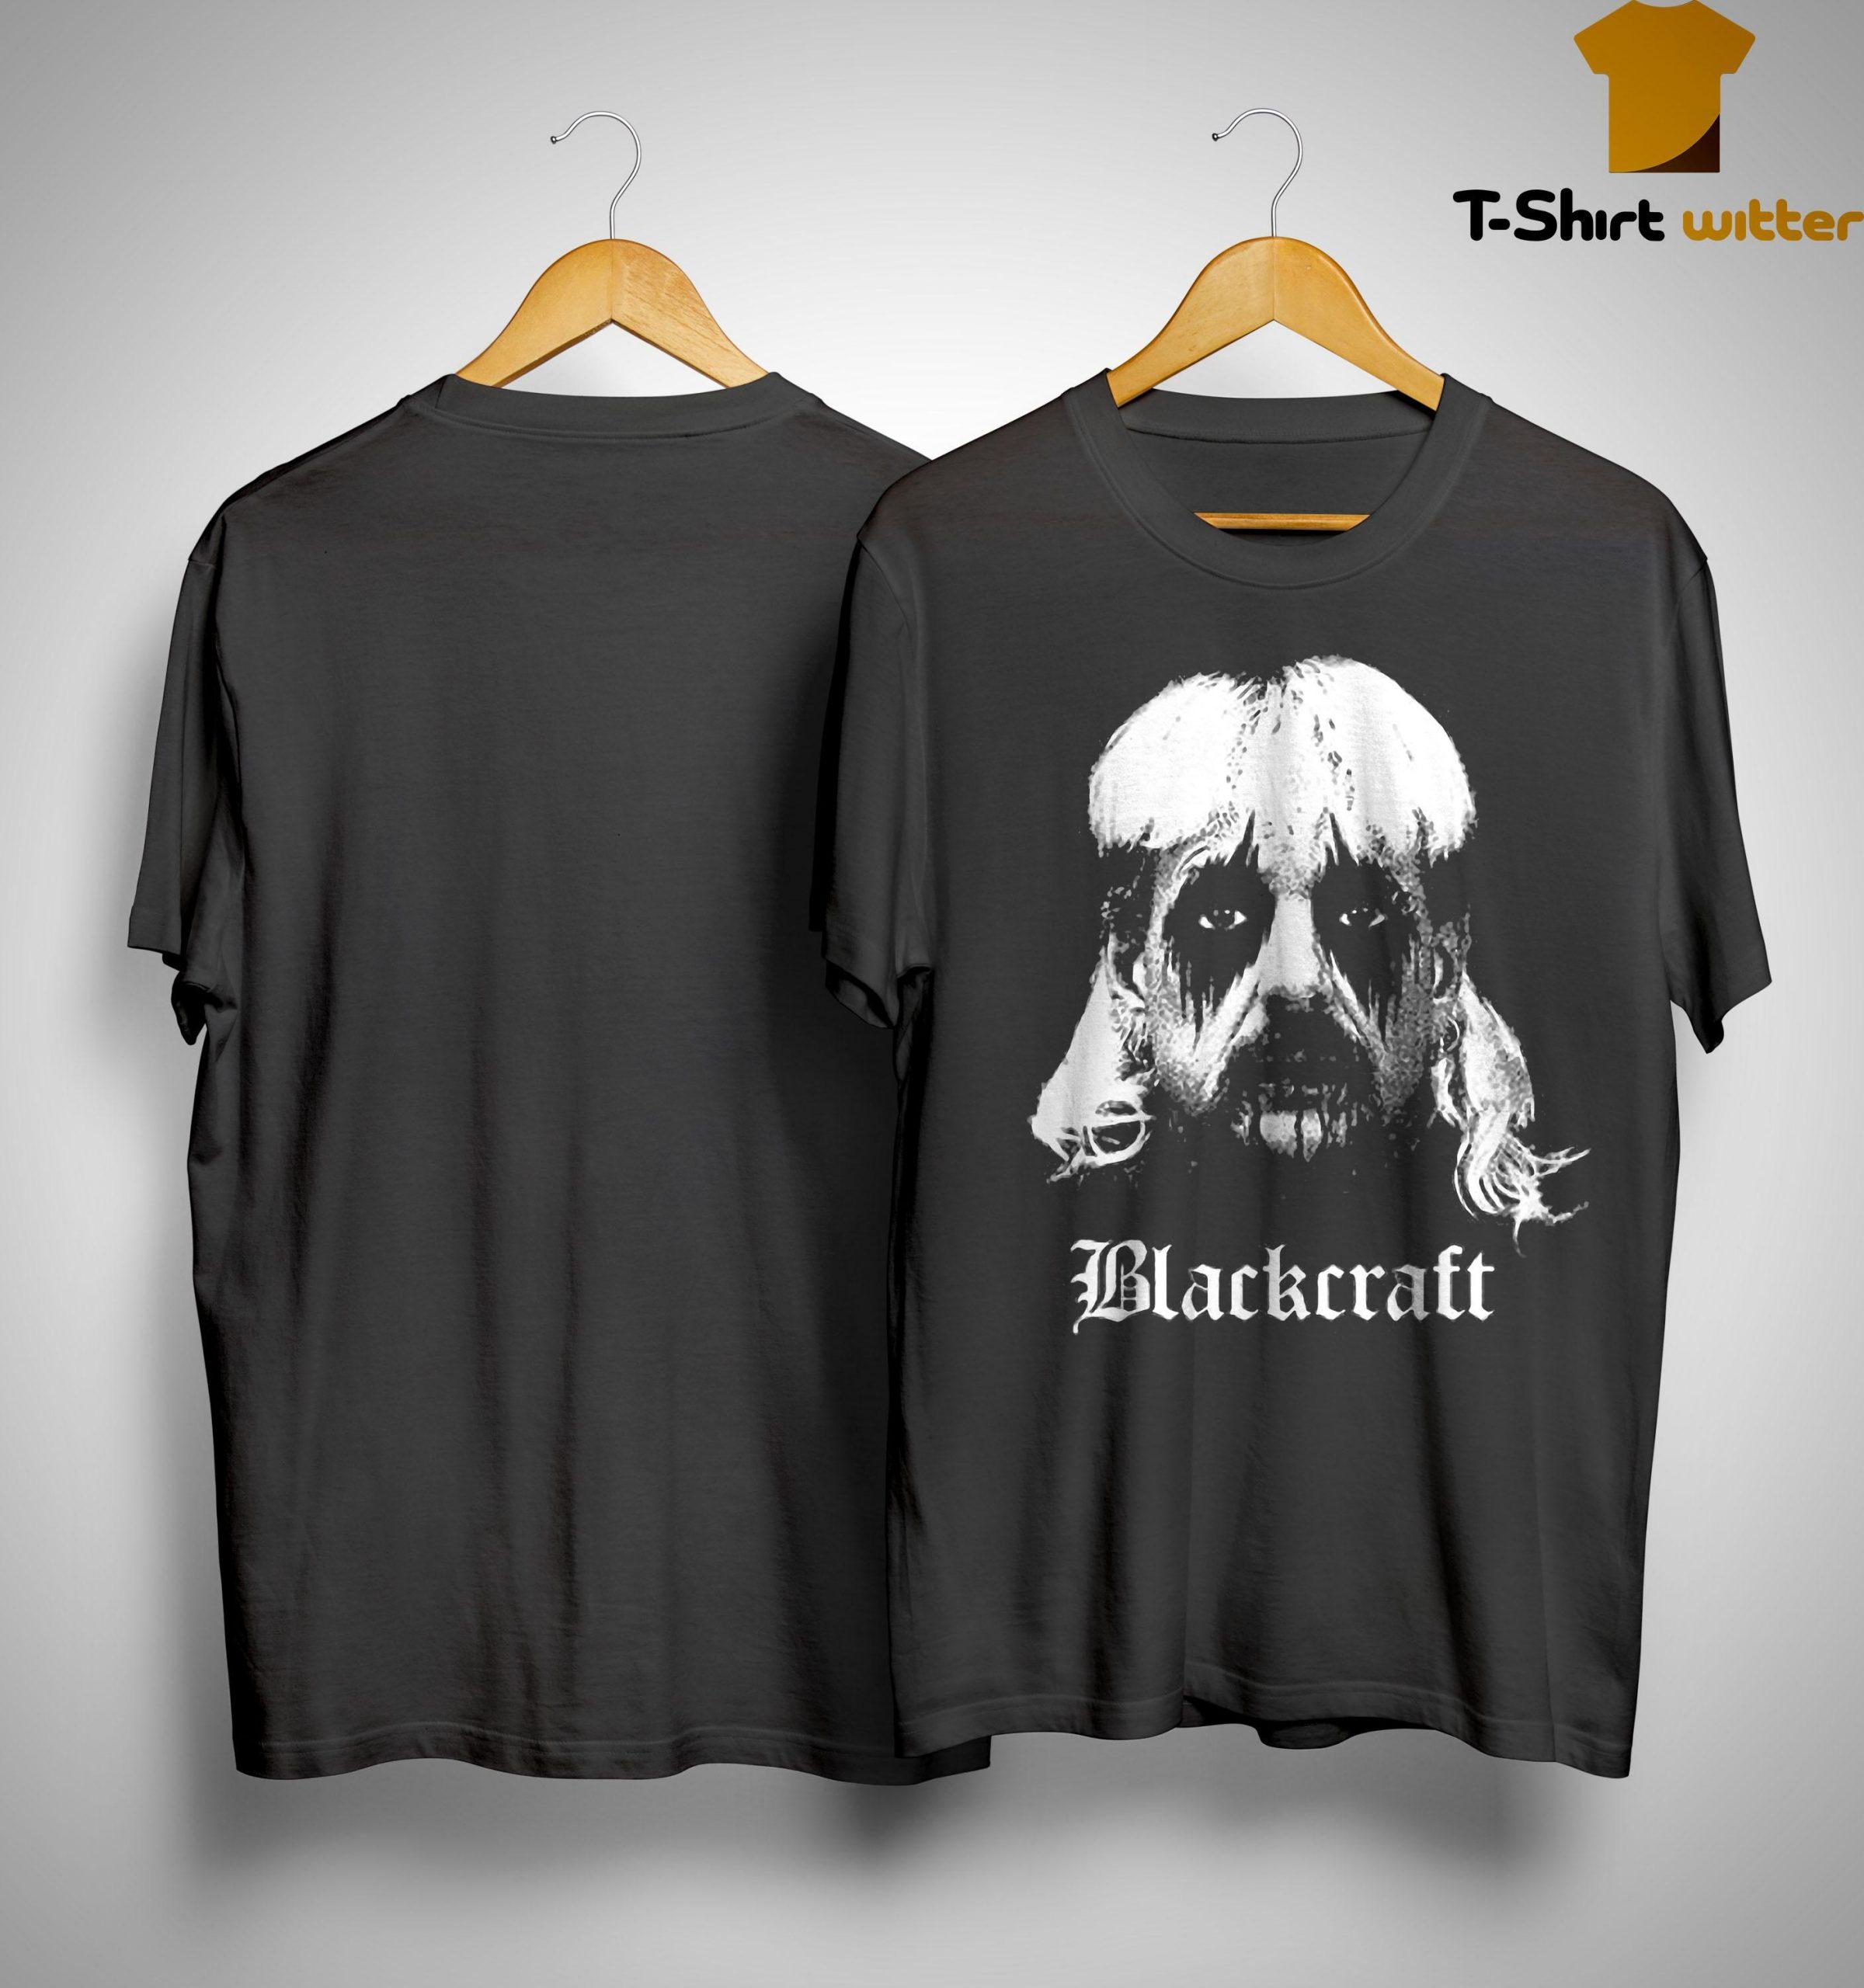 Tiger King Joe Exotic Blackcraft Shirt